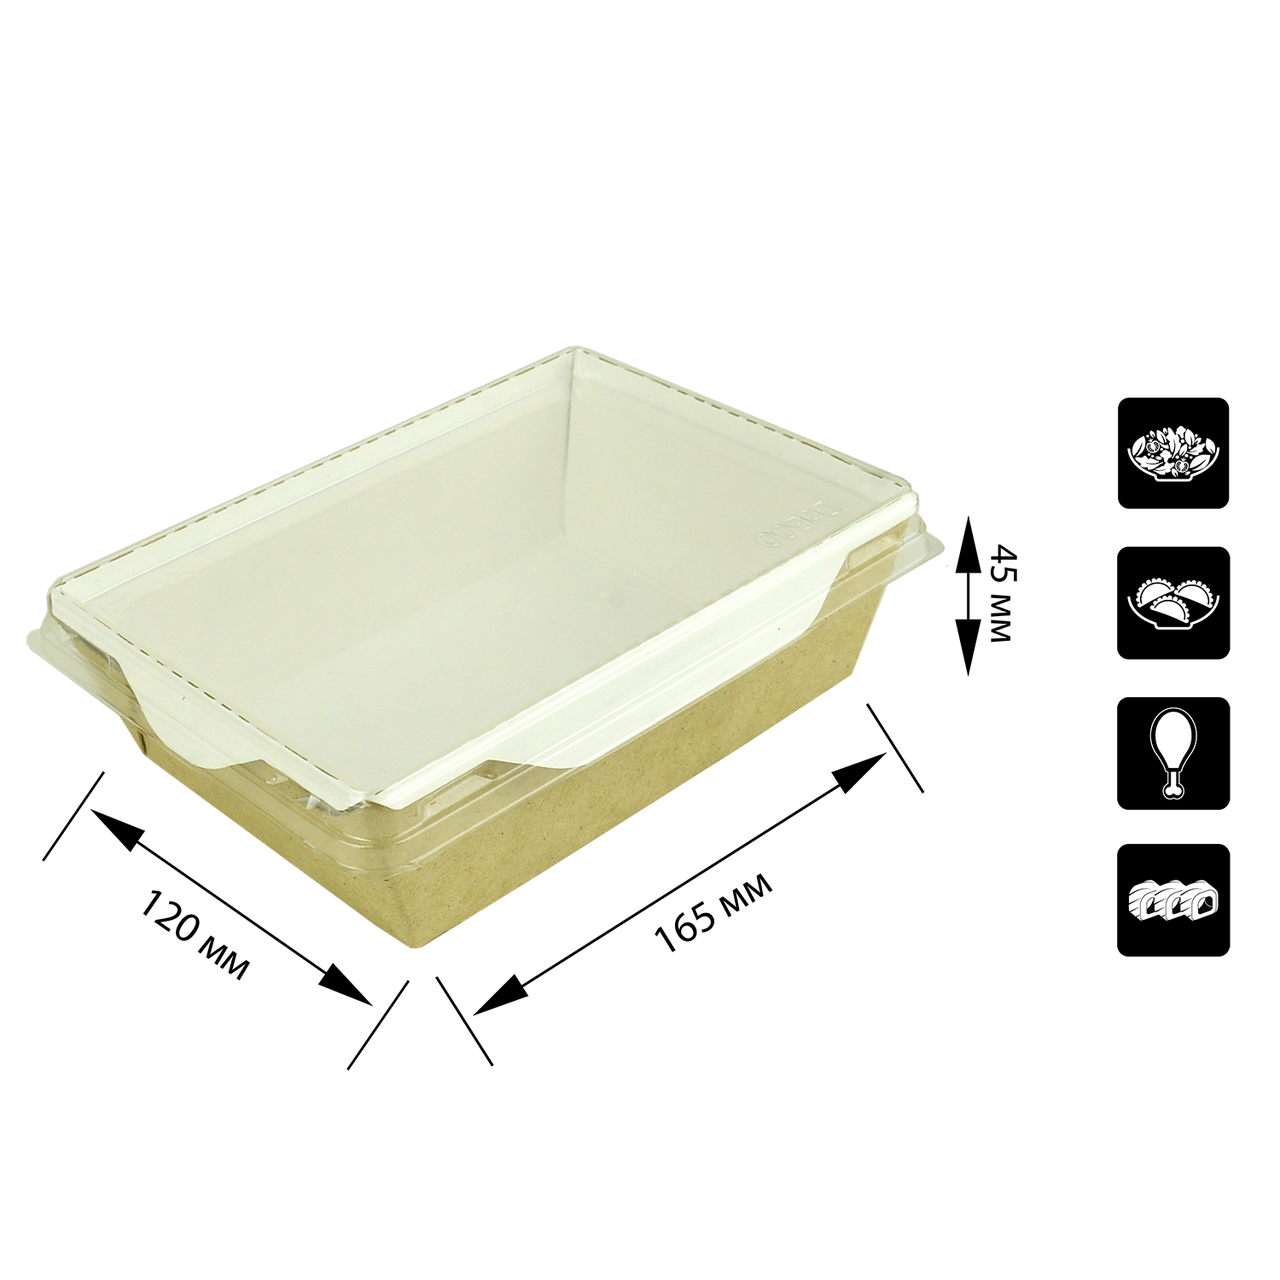 Салатник крафт с пластиковой прозрачной крышкой белый 165х120х45 мм